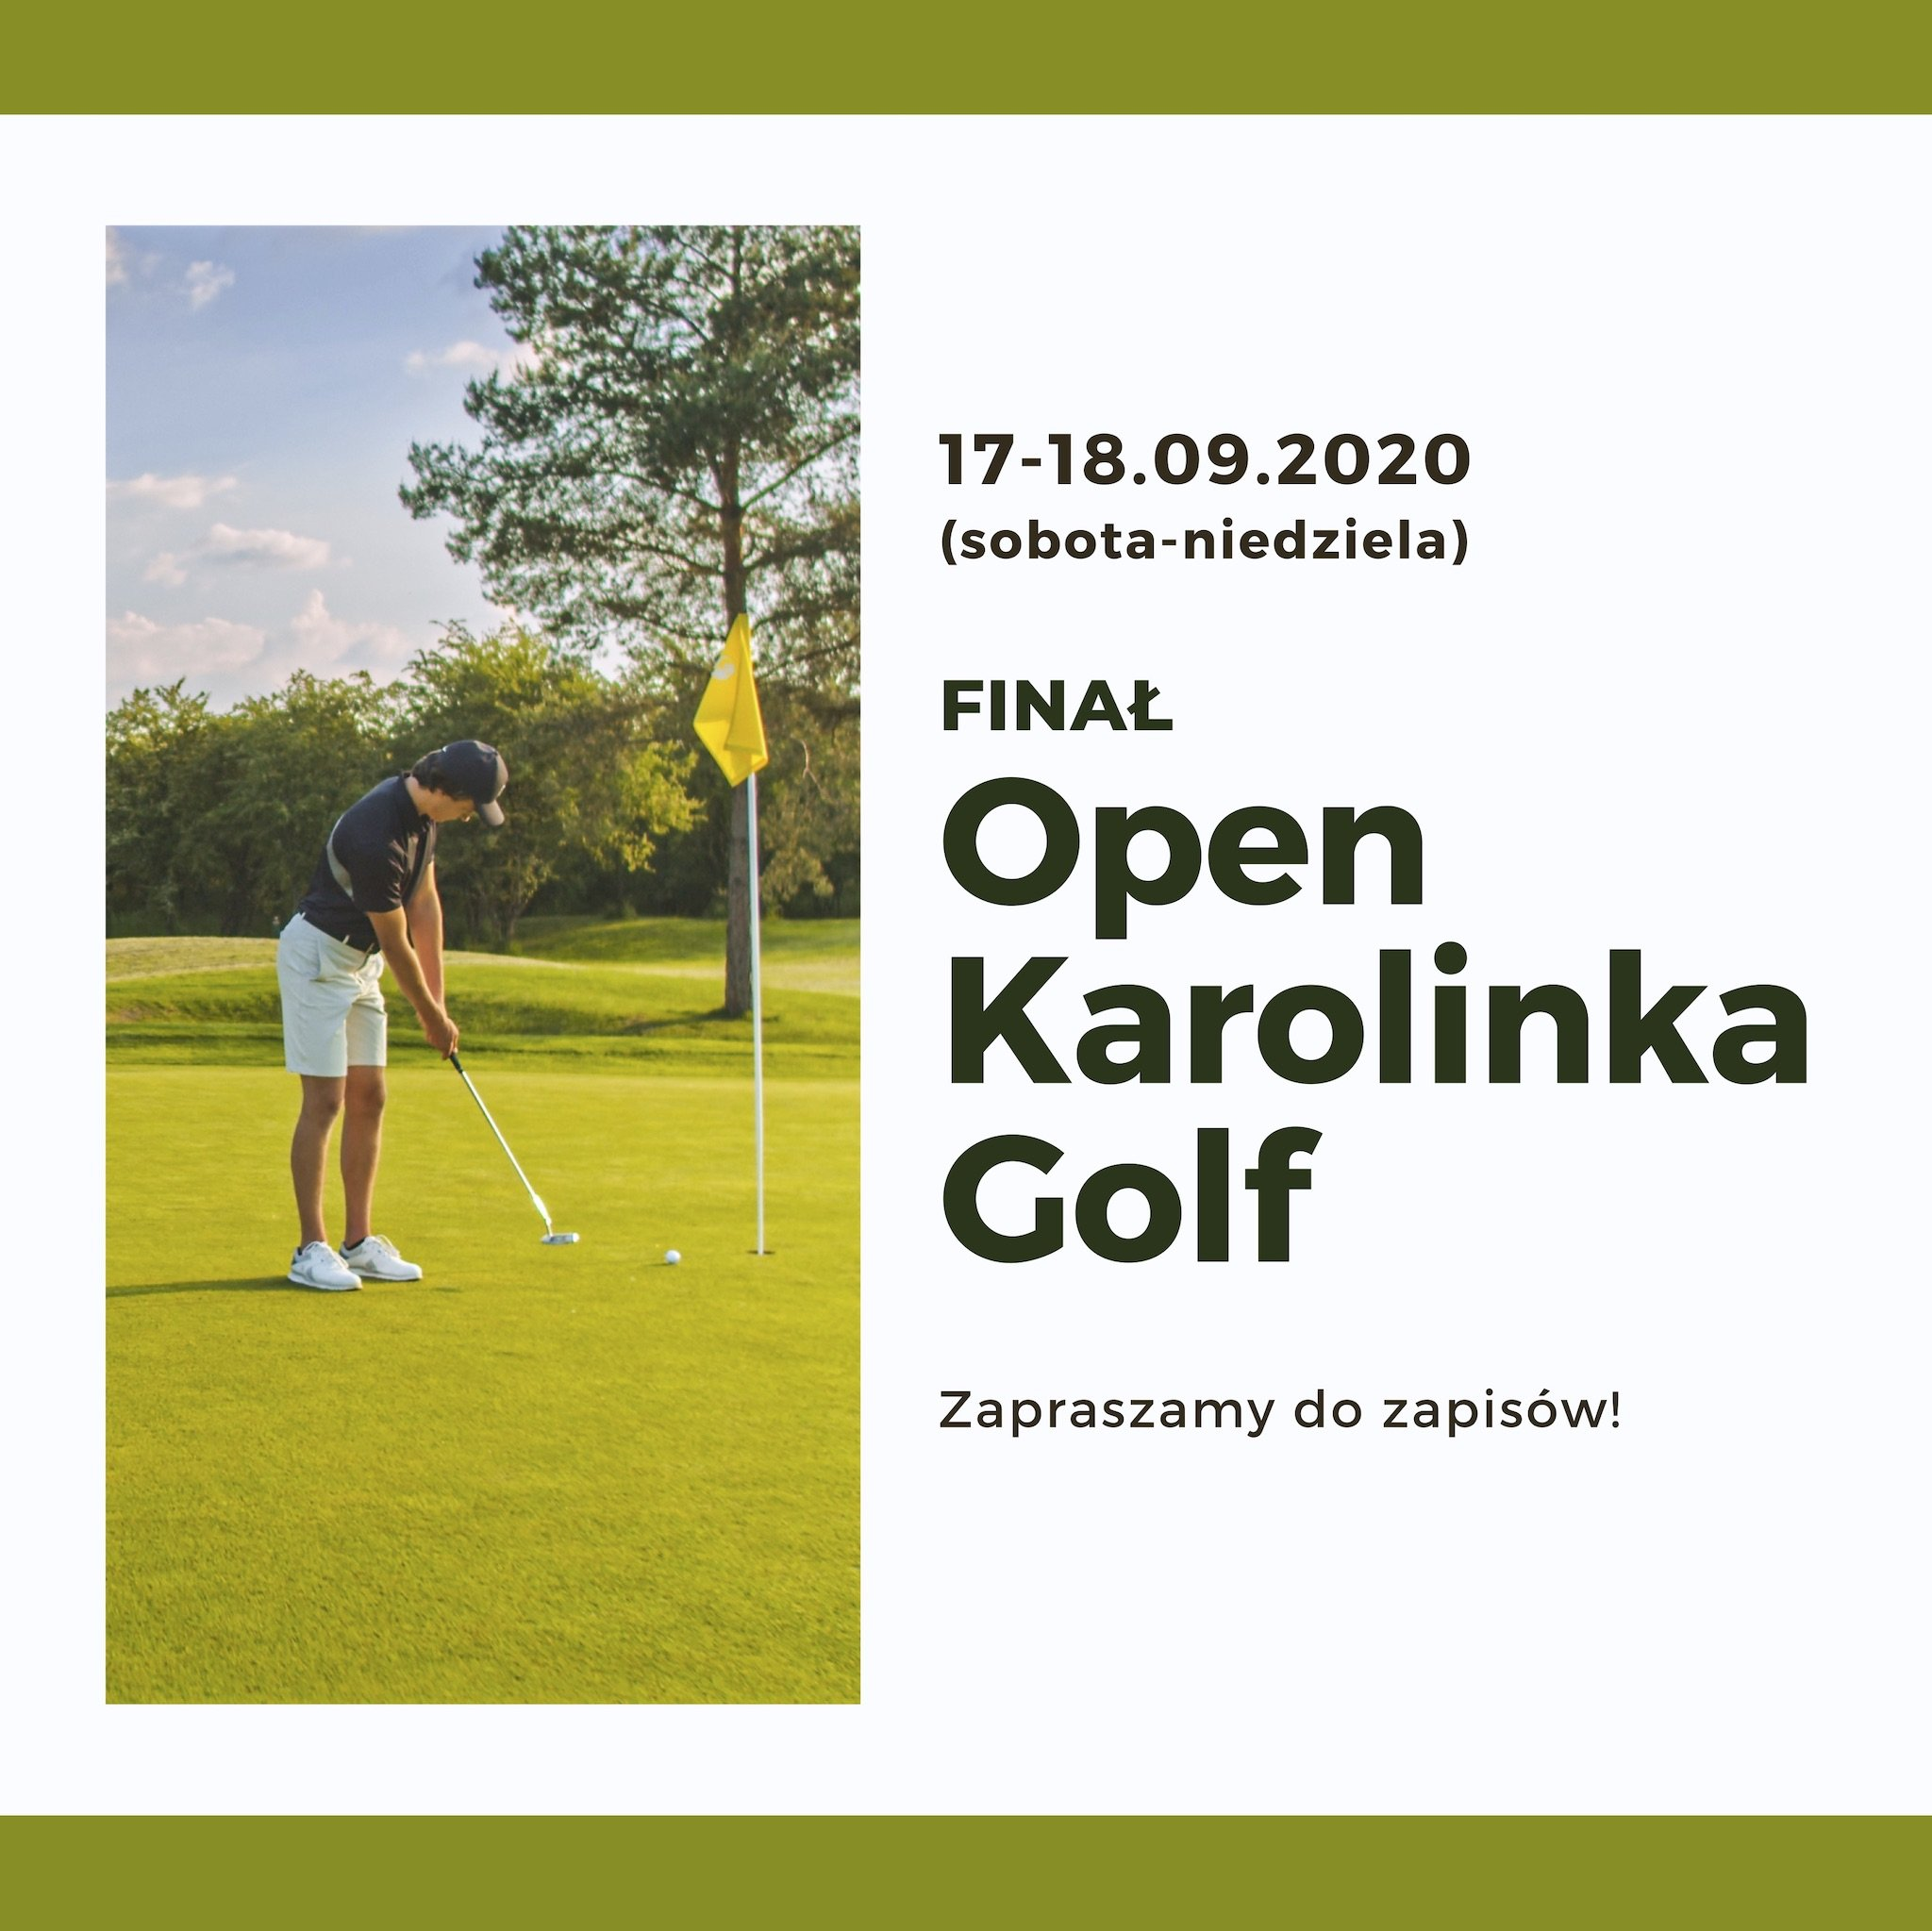 Finał open Karolinka Golf